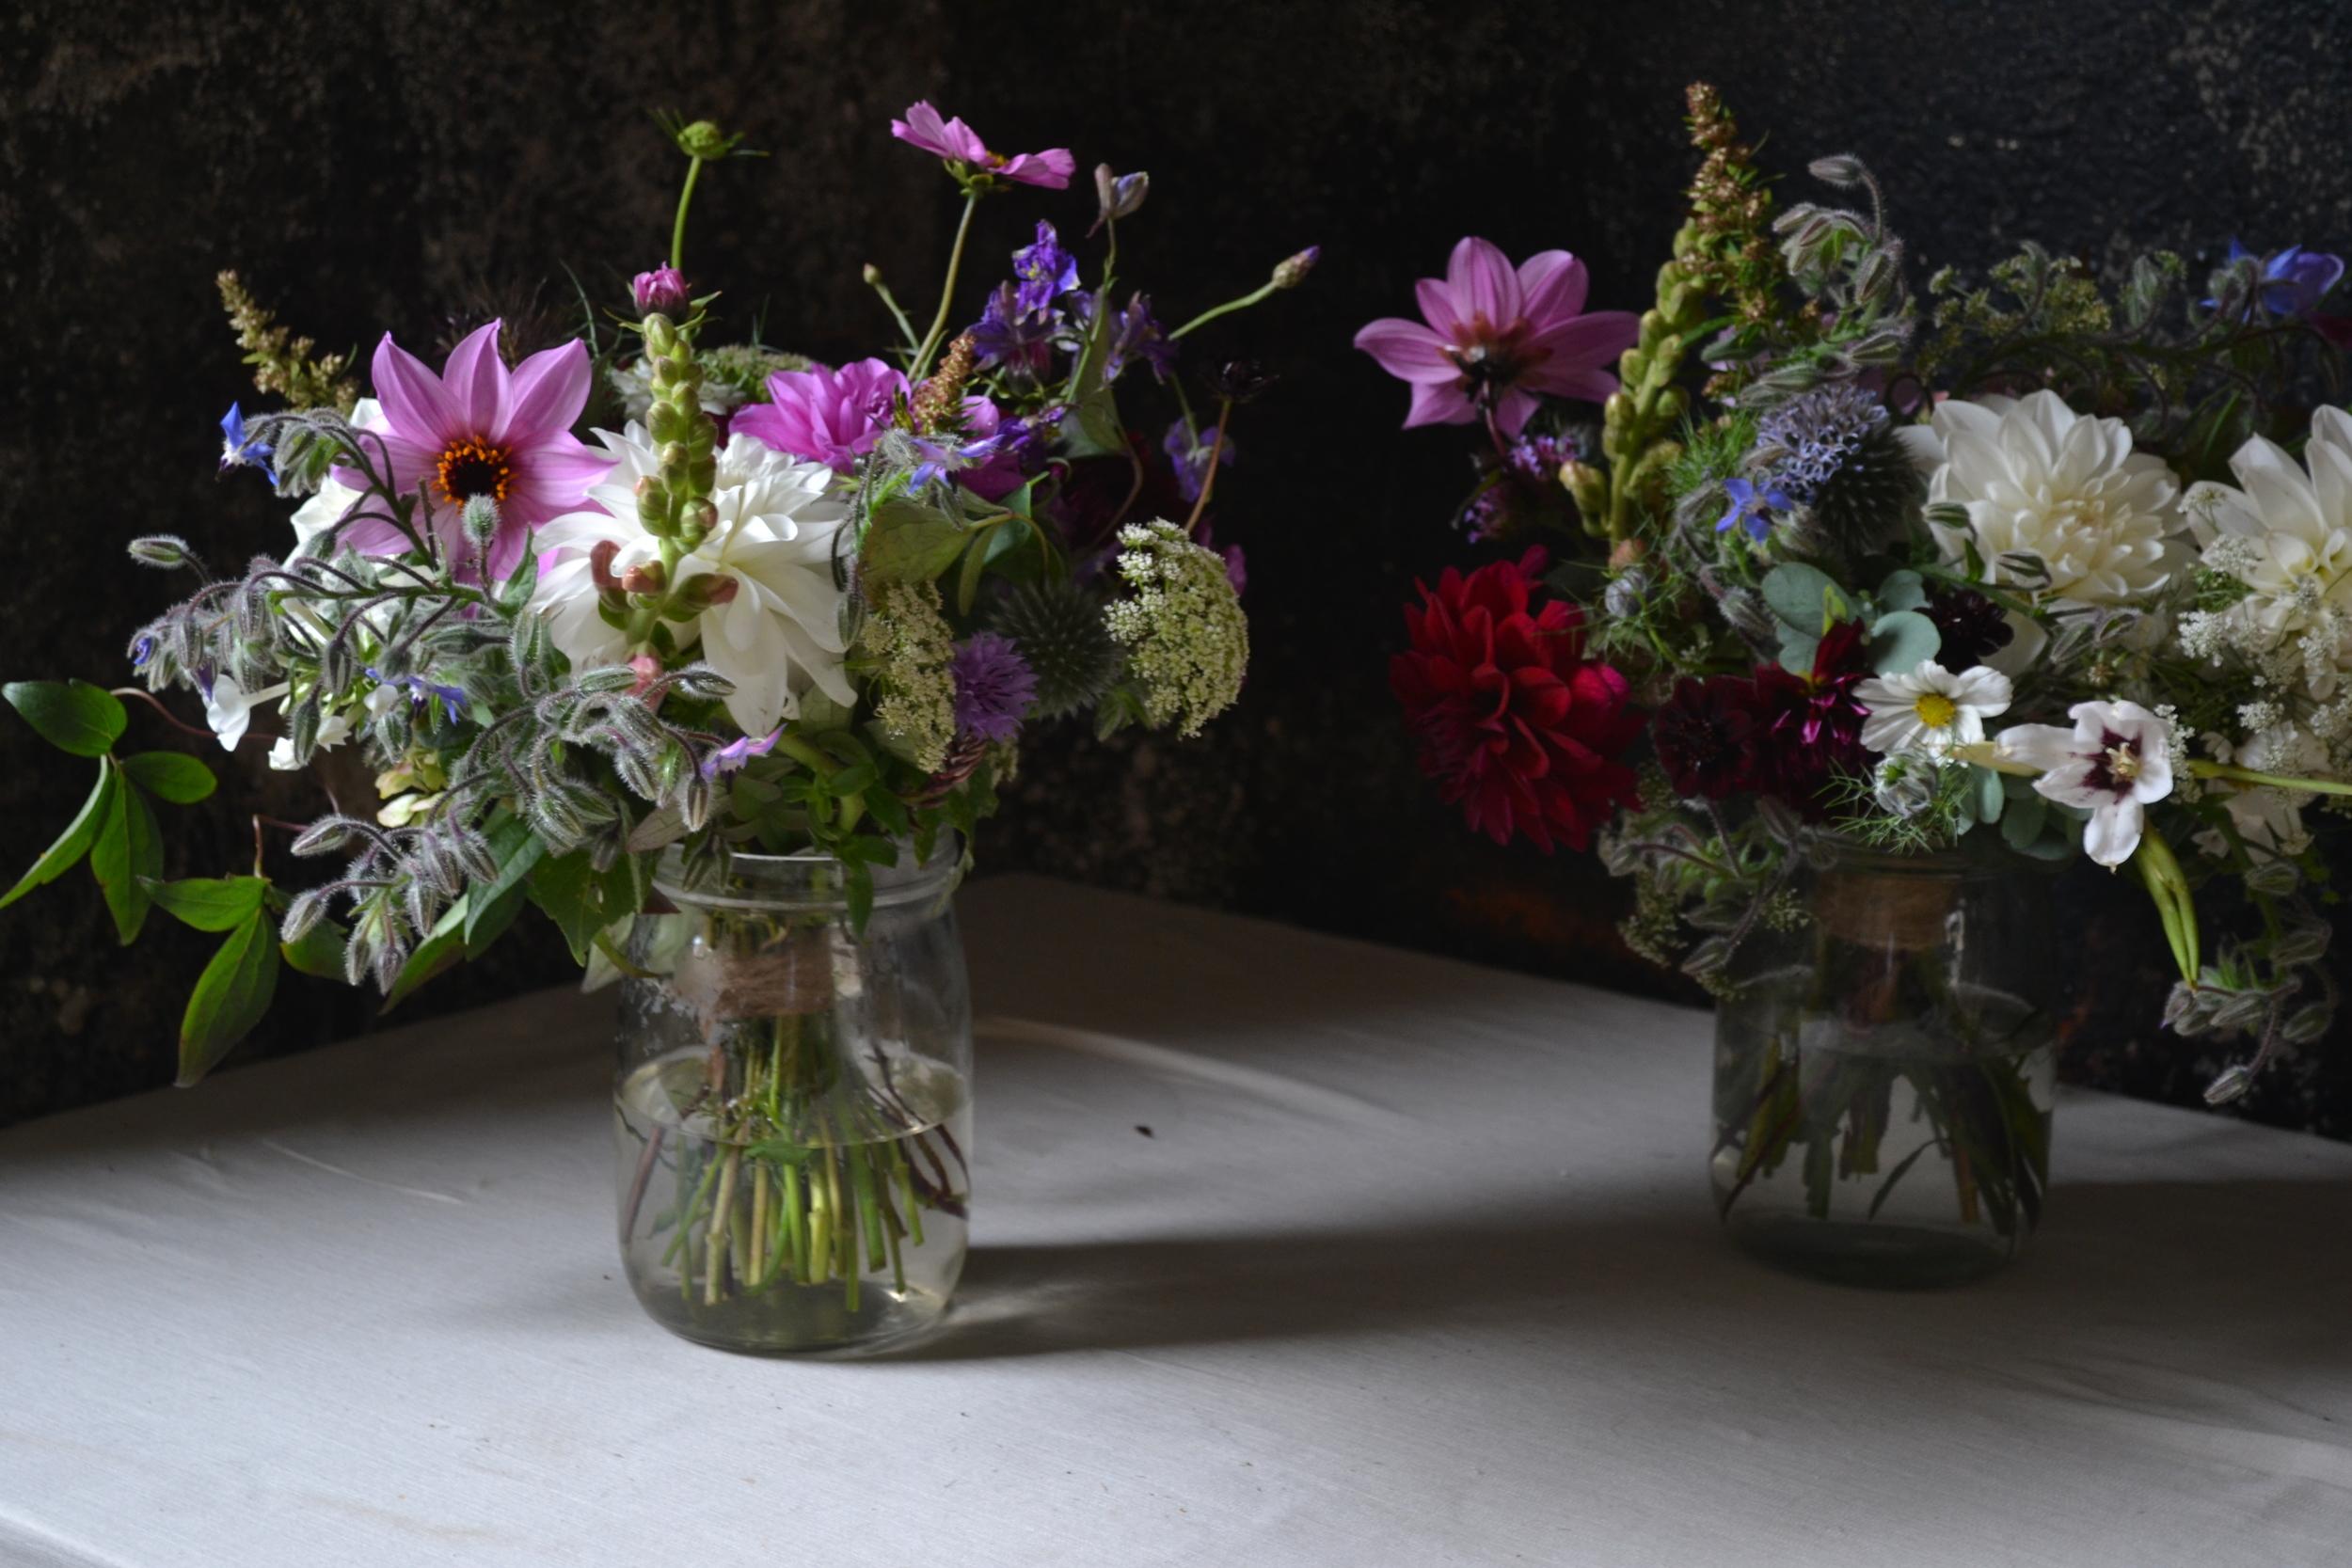 141024 - GG - Helens bridal flowers 046.JPG